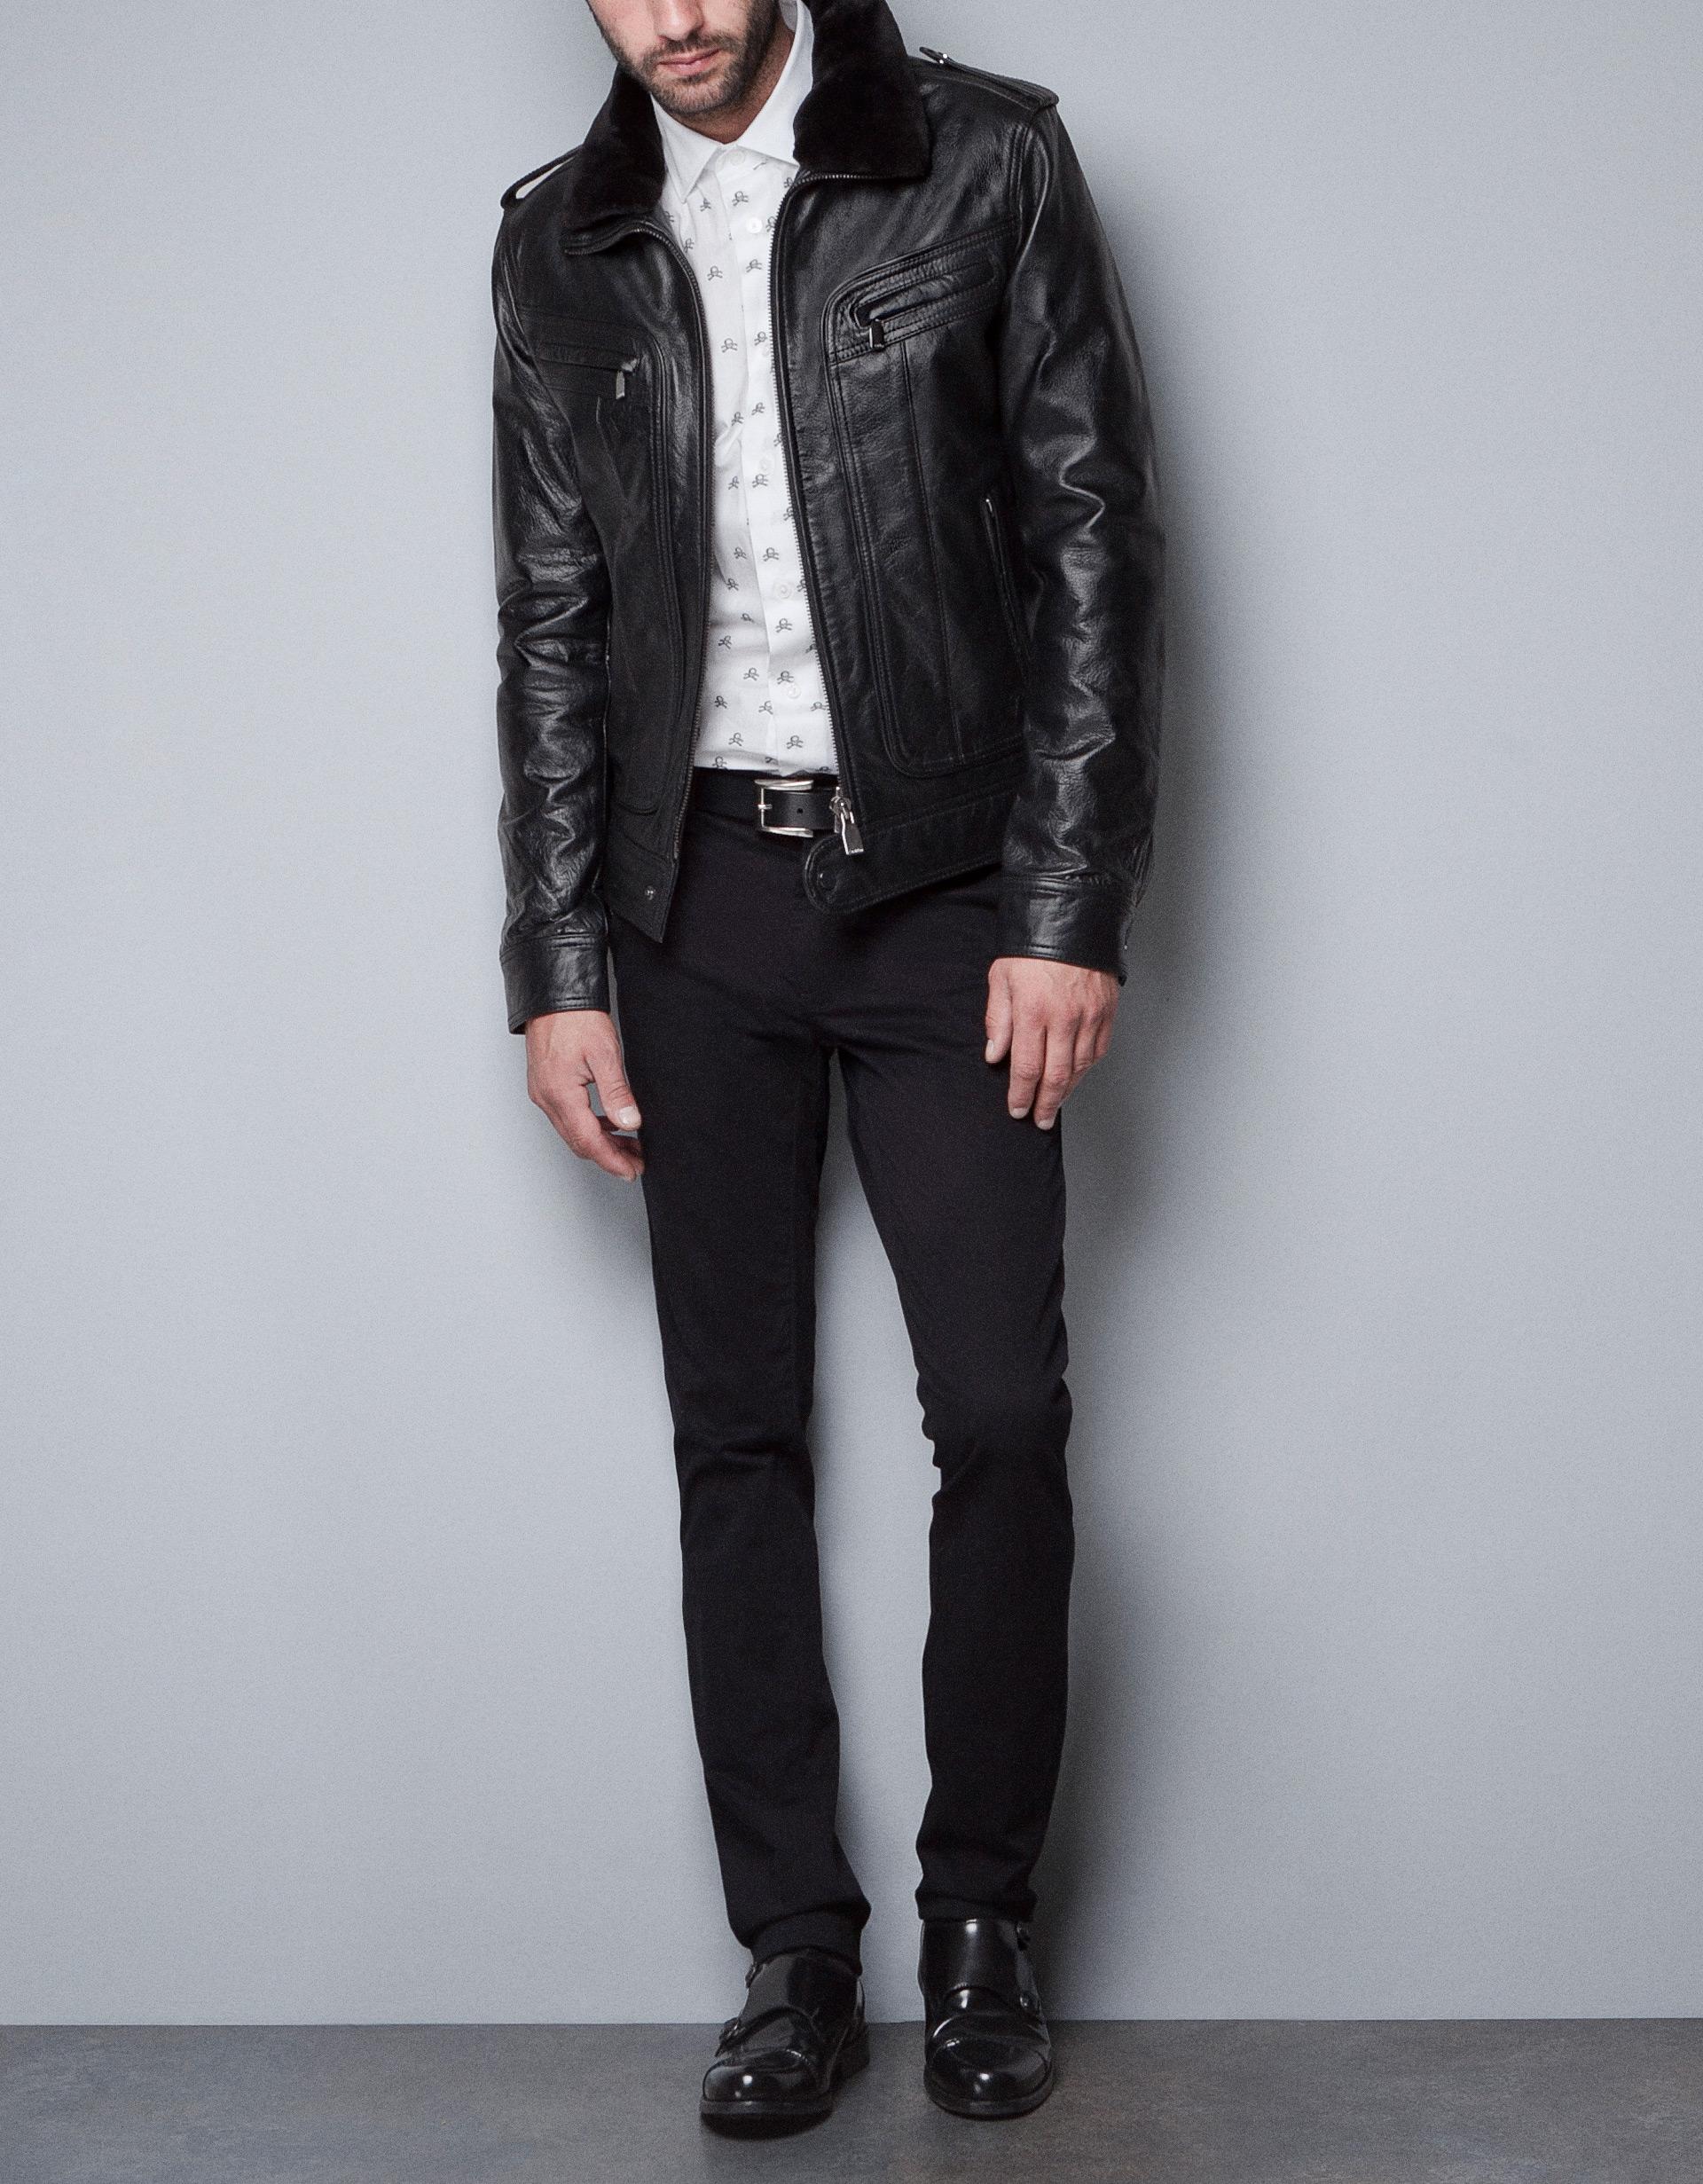 Men's jacket collar - Mens Leather Jacket Fur Collar